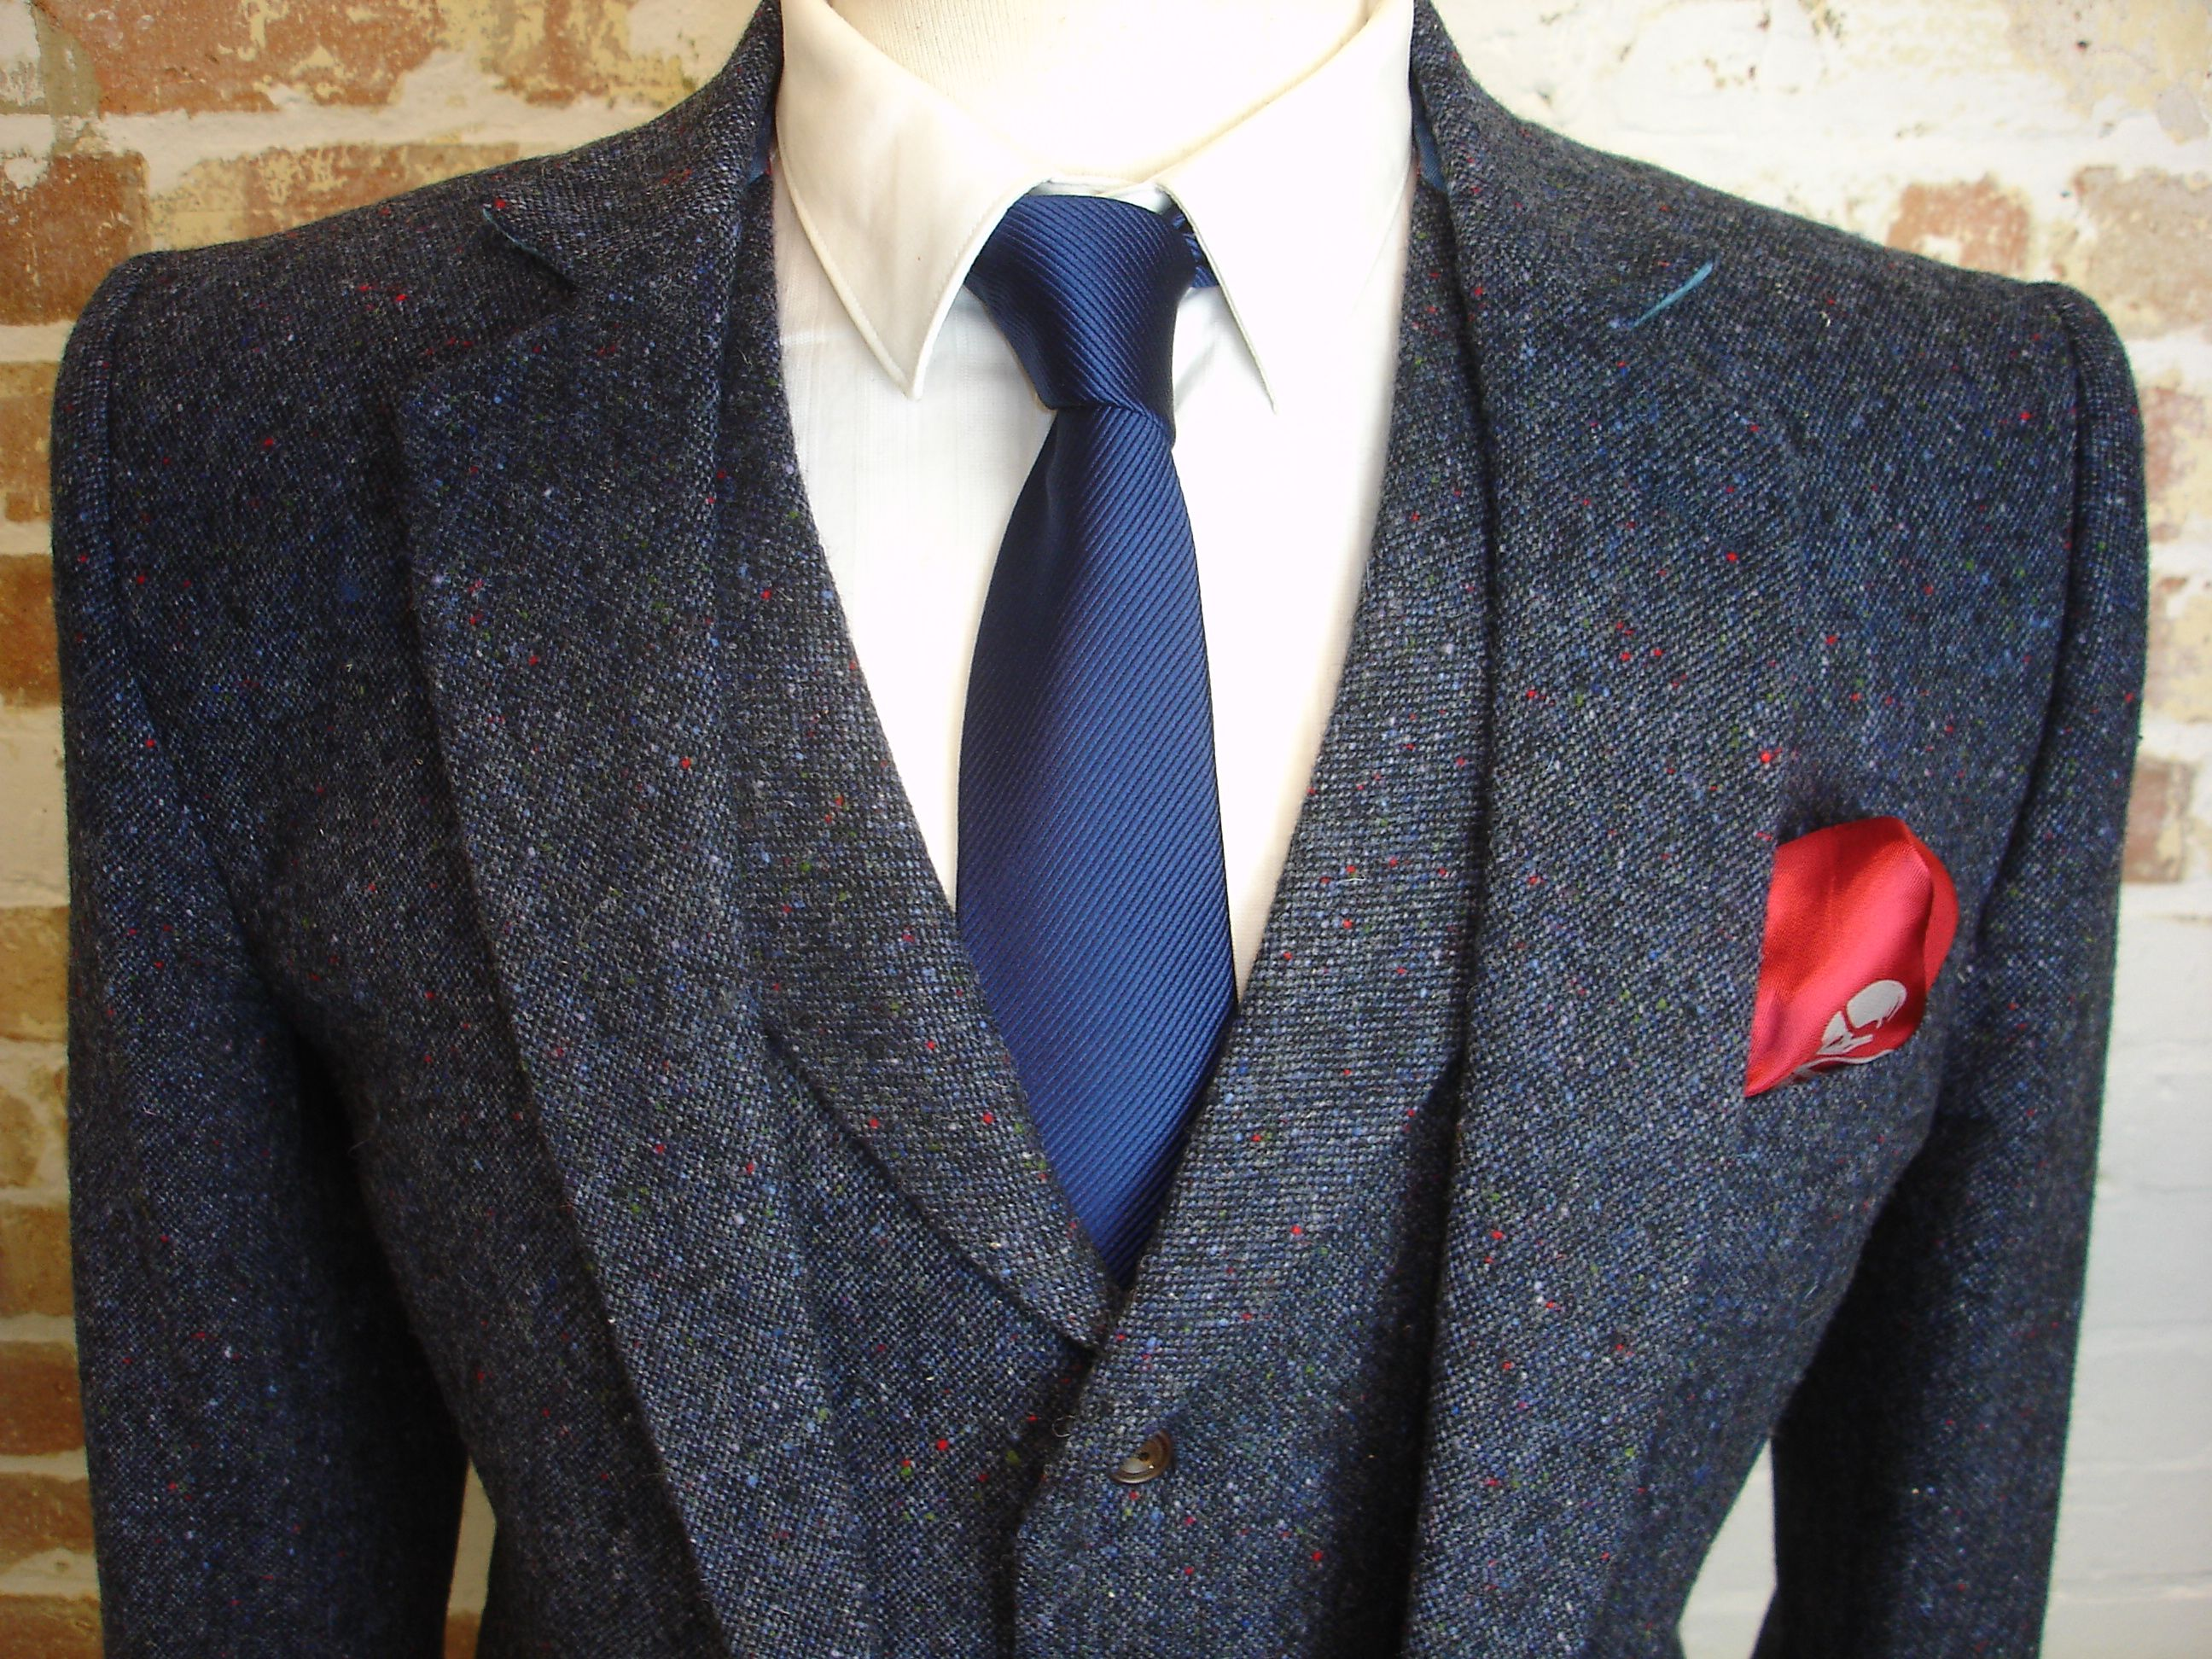 3 Piece Wedding Suit in Blue Donegal Tweed | tweed wedding suits ...